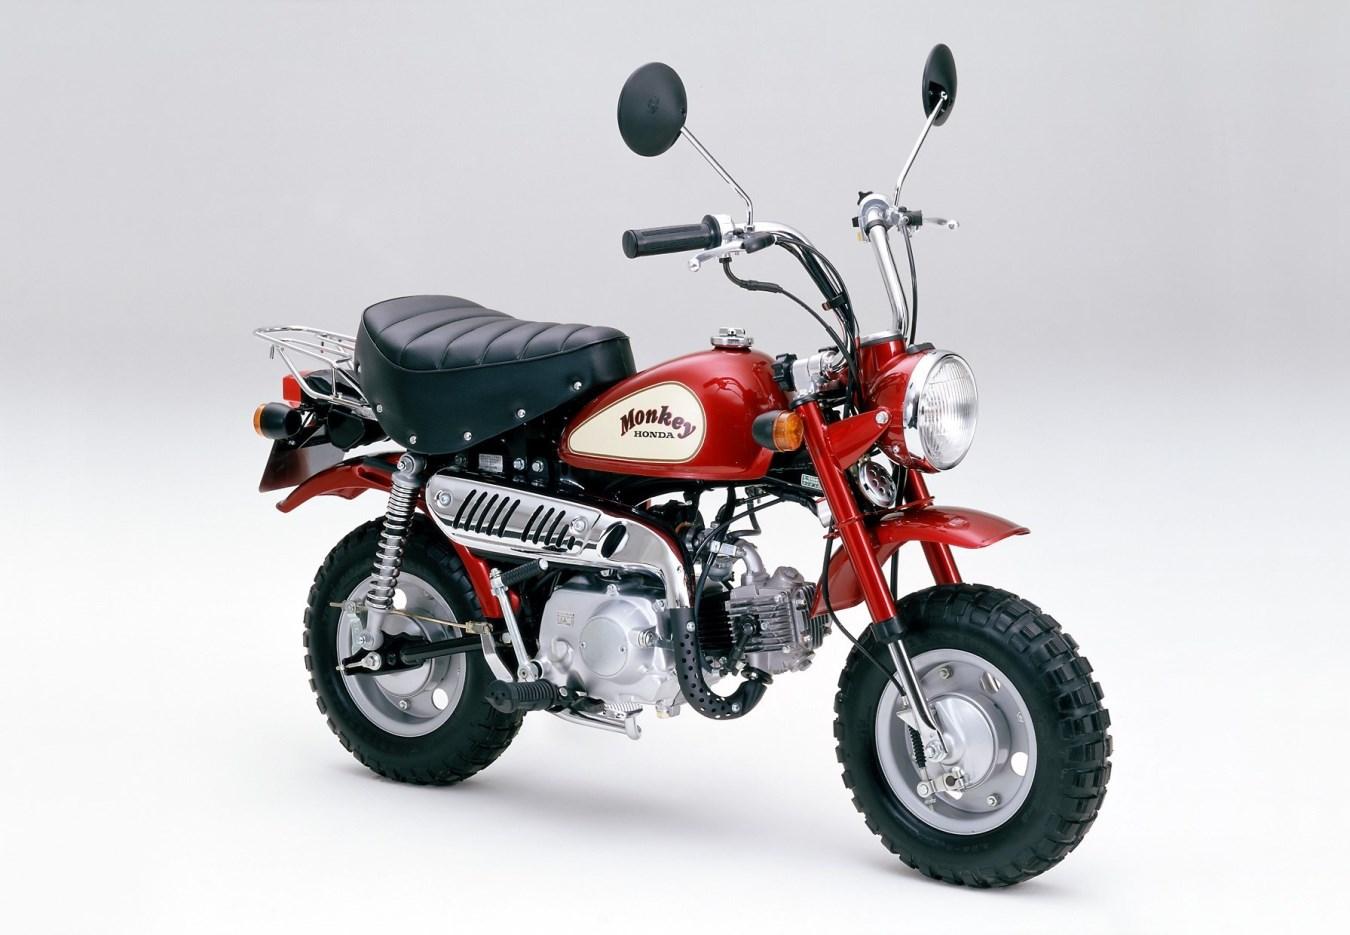 1988 - A-Z50J, לראשונה צמד מראות